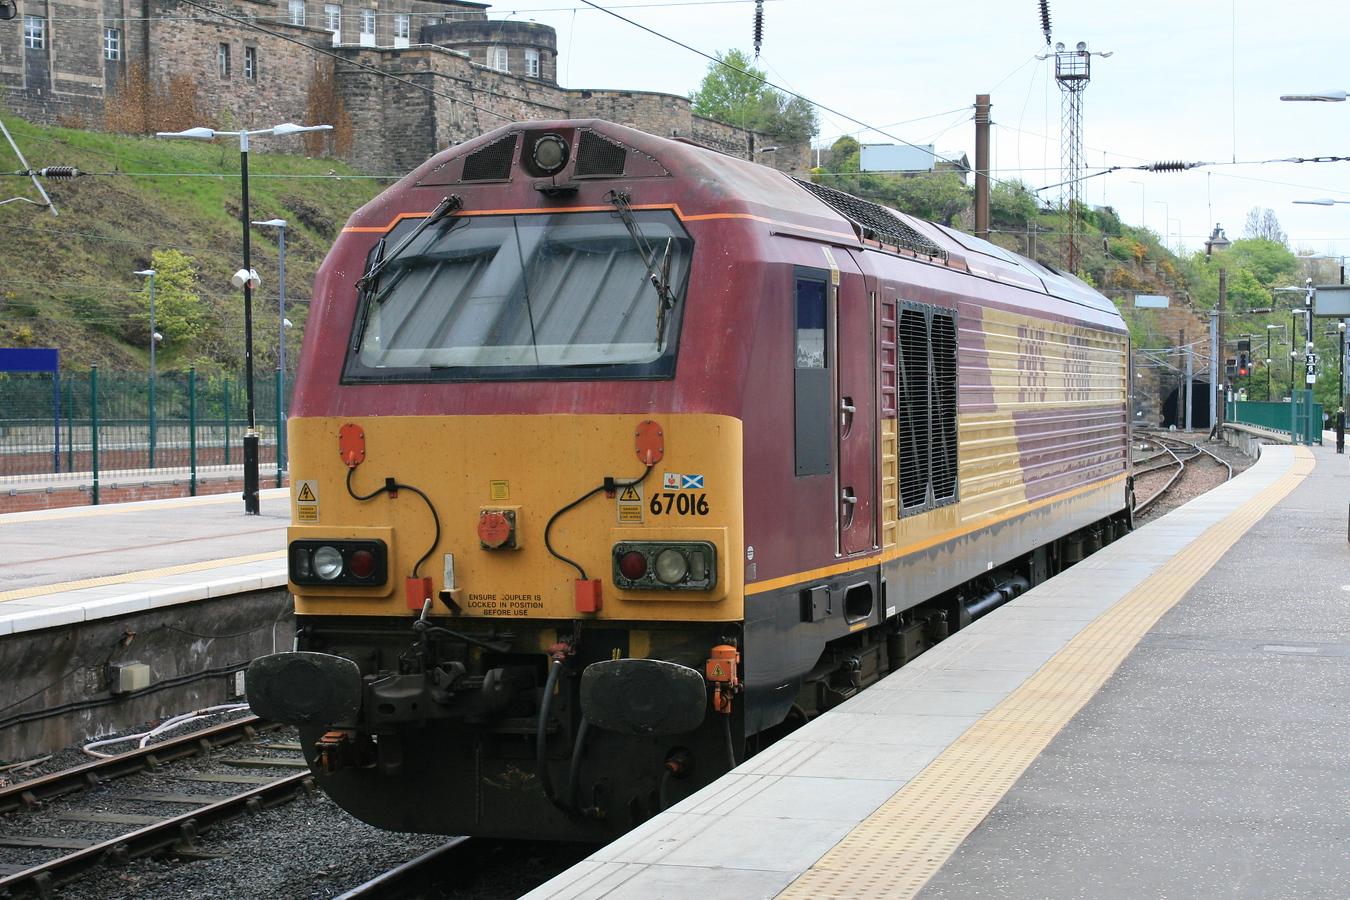 67016_DBS_EdinburghWaverley_17052016 (92)